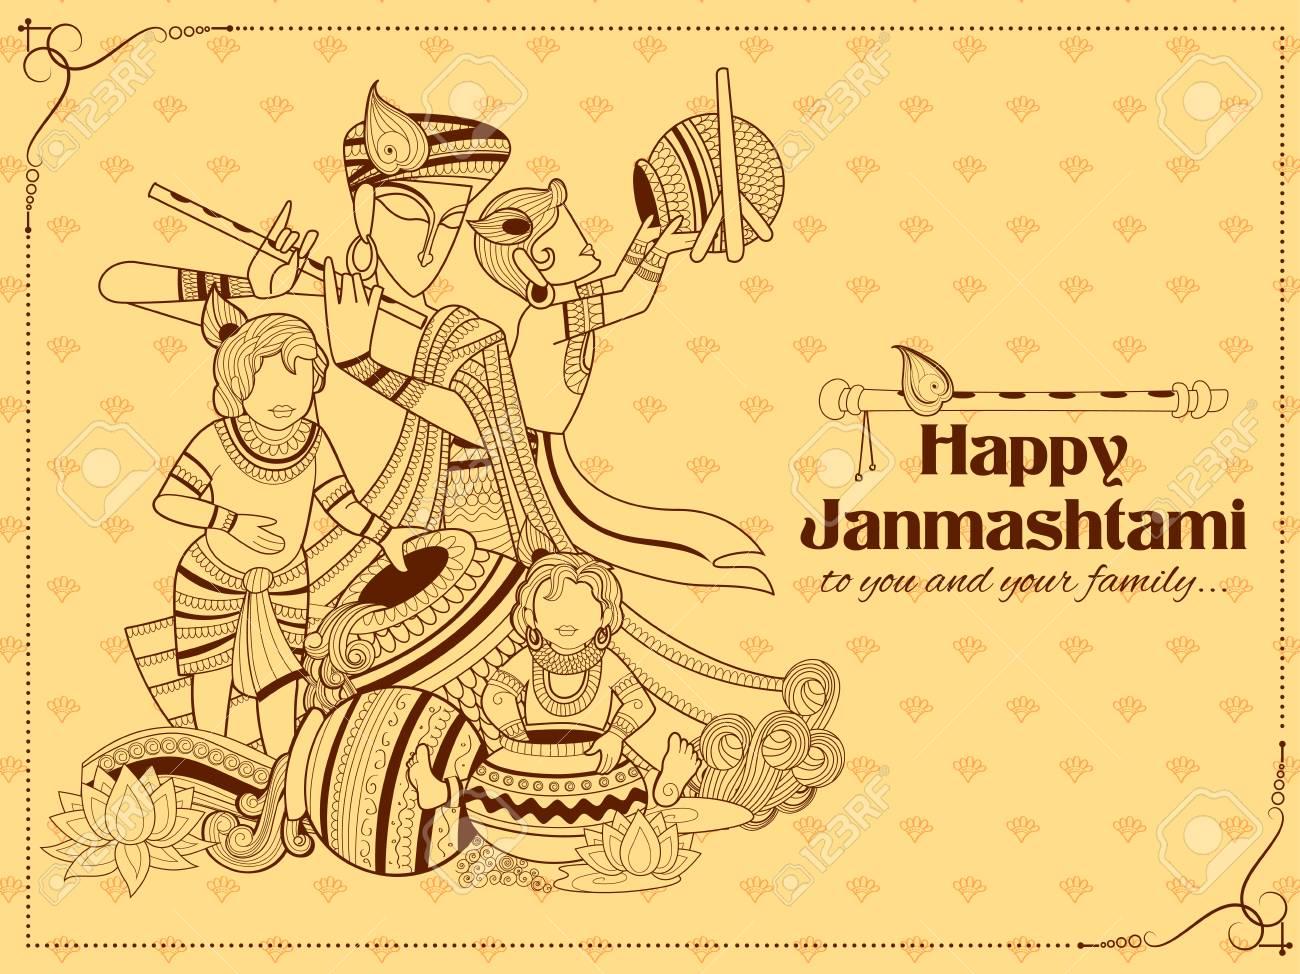 Lord Krishna With Hindi Text Meaning Happy Janmashtami Festival